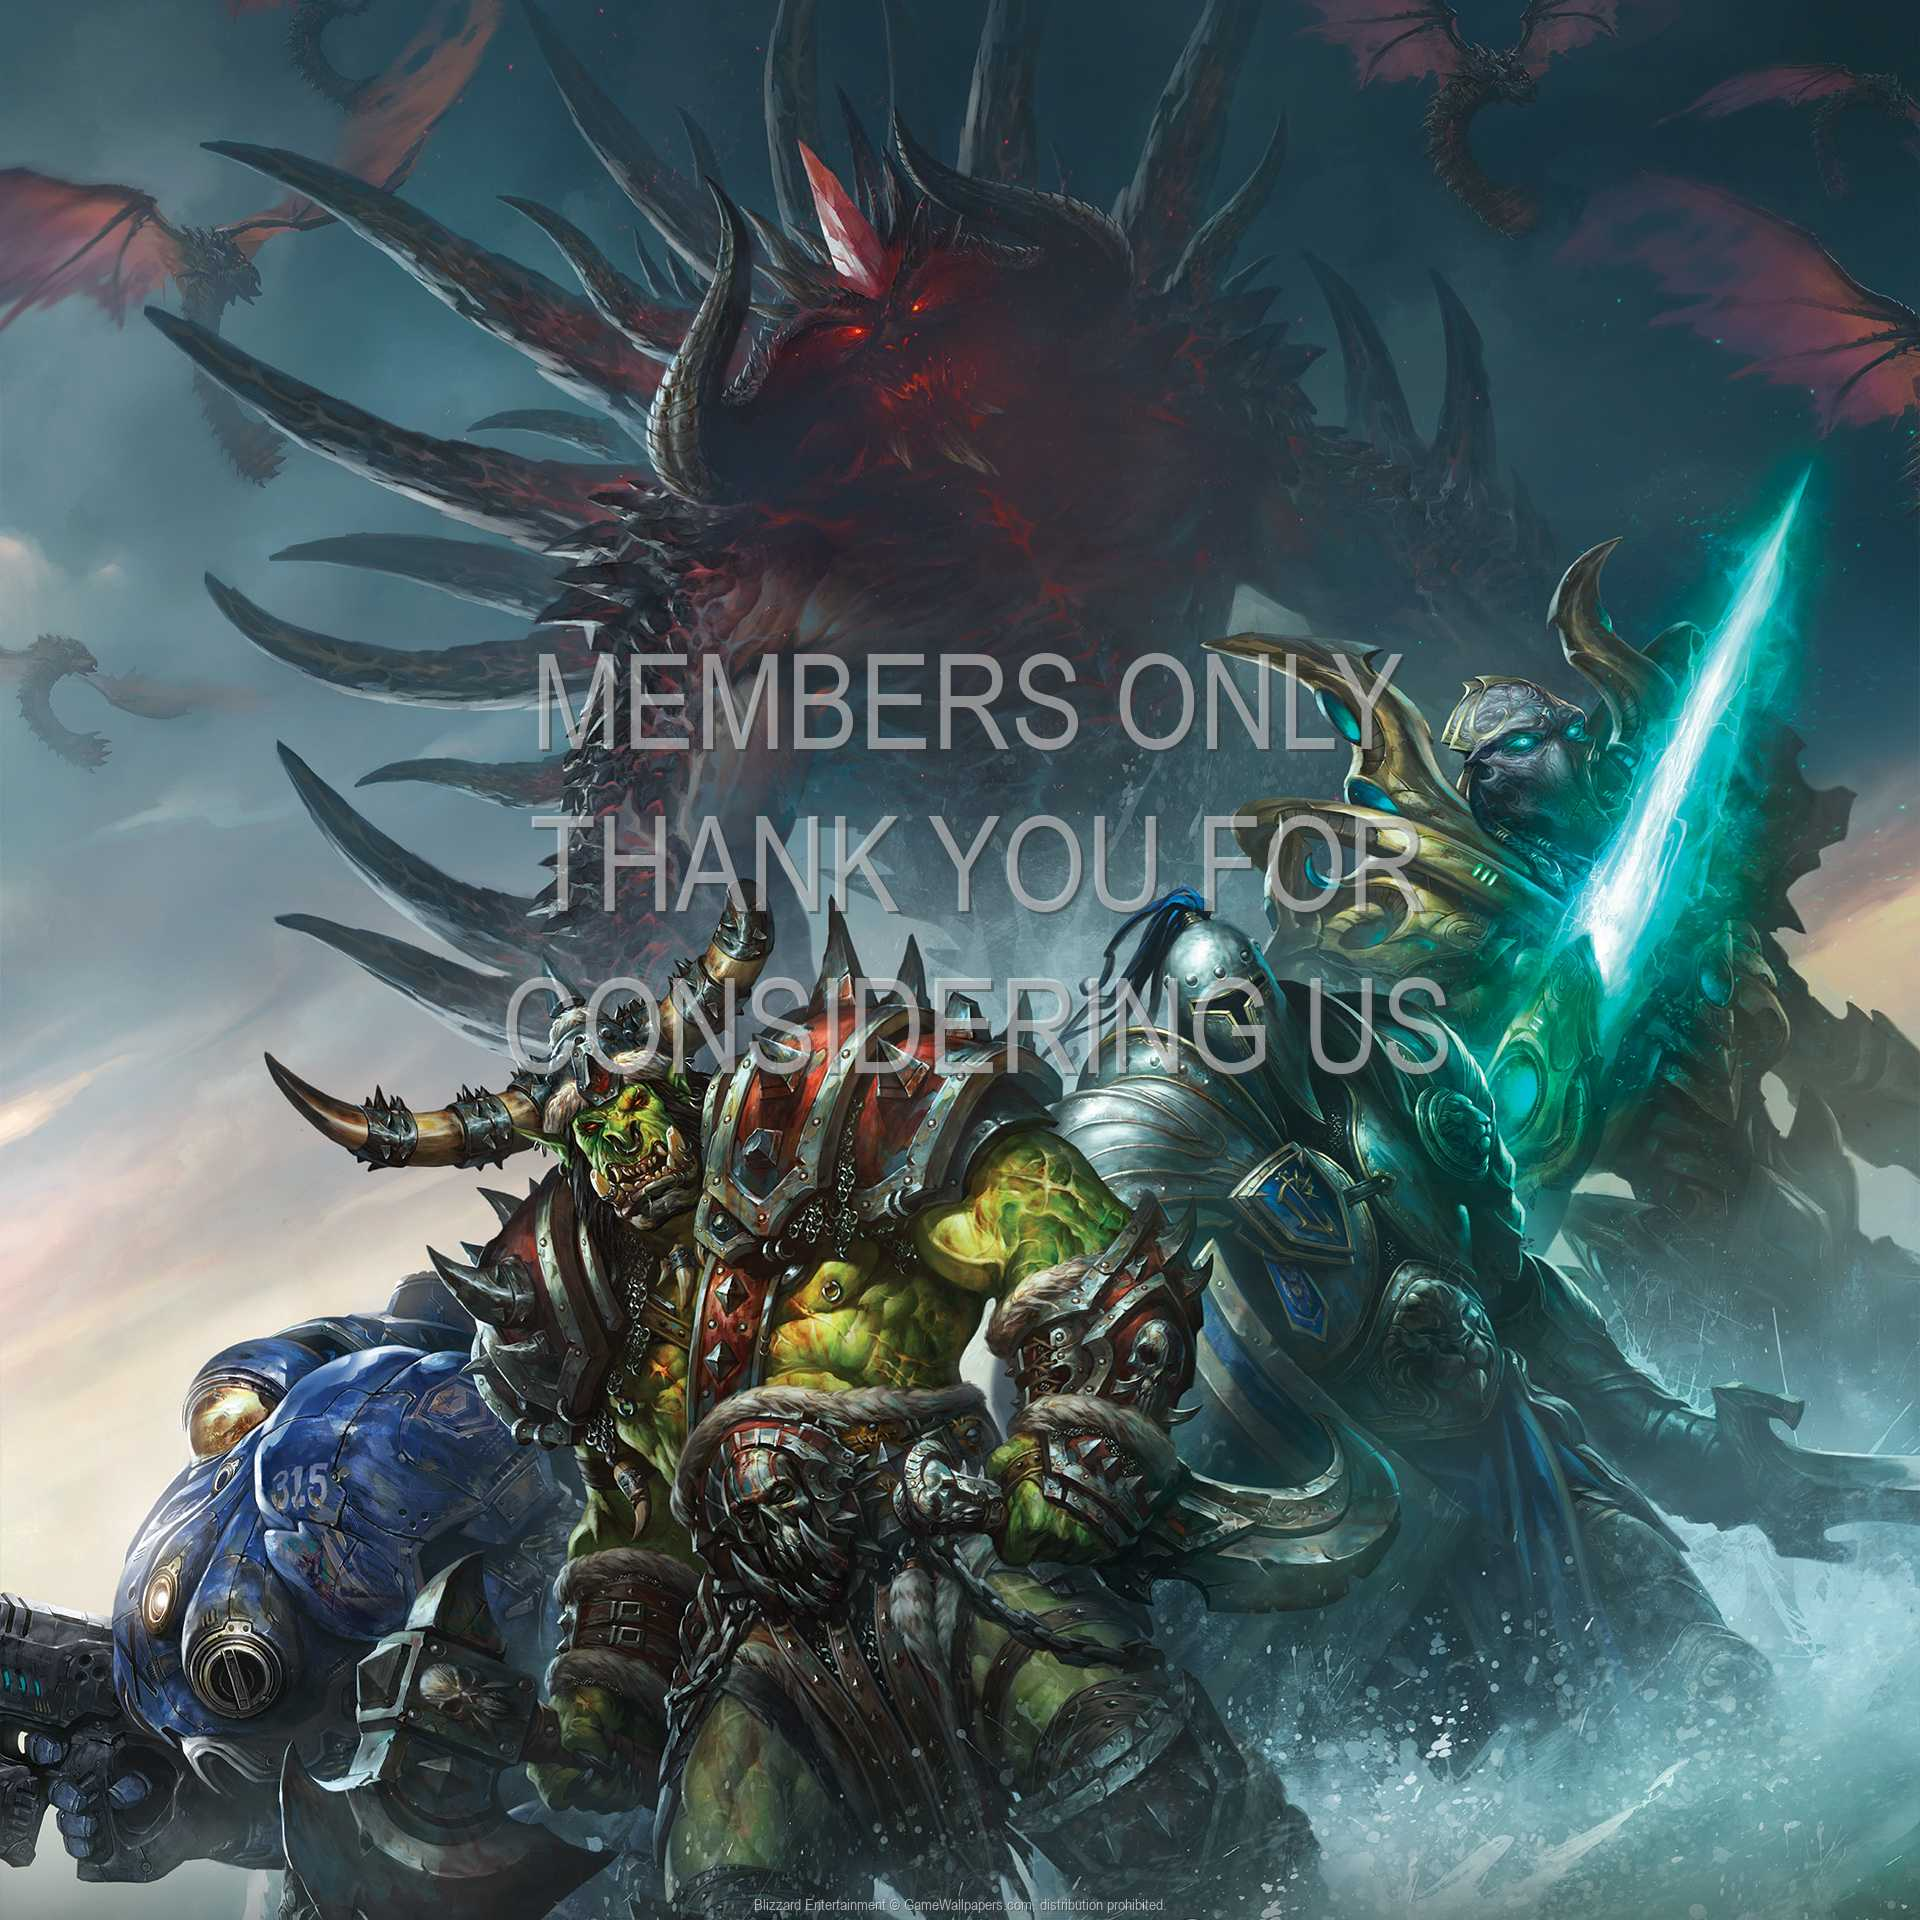 Blizzard Entertainment 1080p Horizontal Mobile wallpaper or background 01